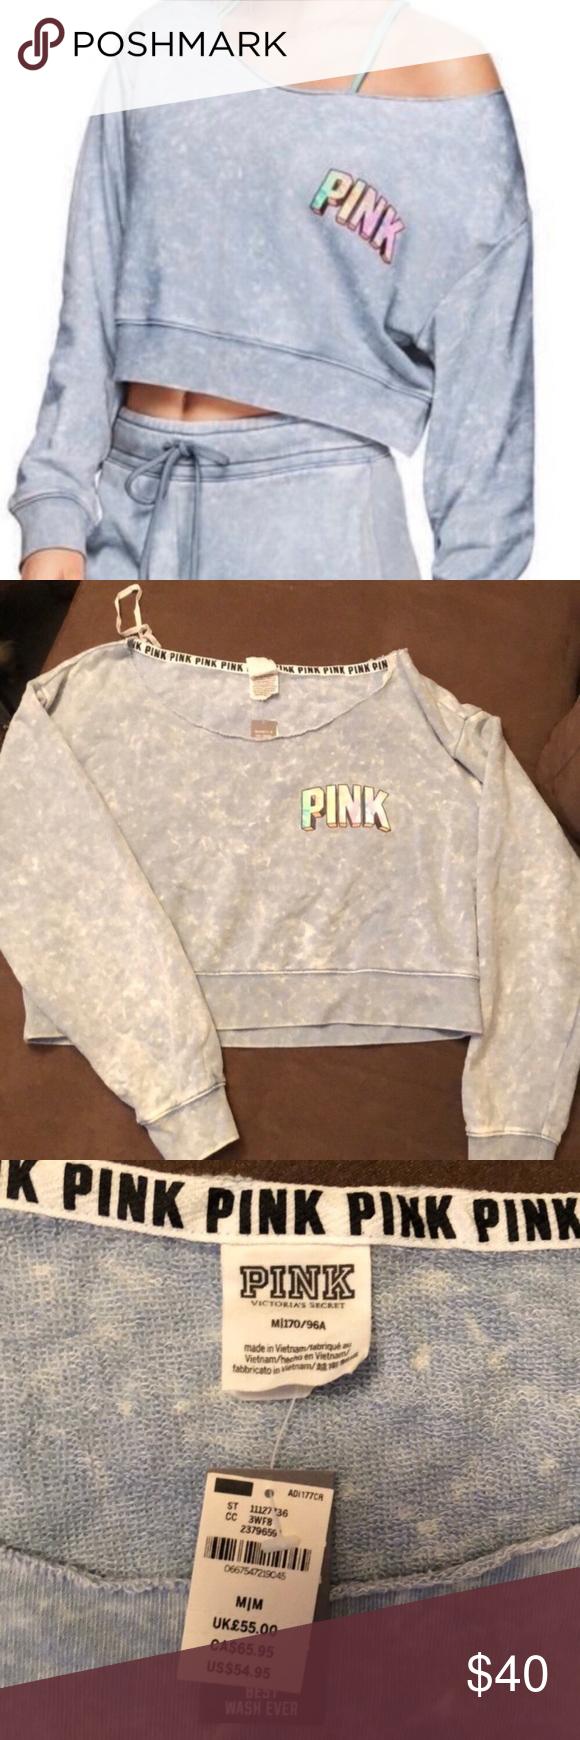 Victoria/'s Secret Pink Sweatshirt Lightweight Pullover Top Graphic Vs New Nwt